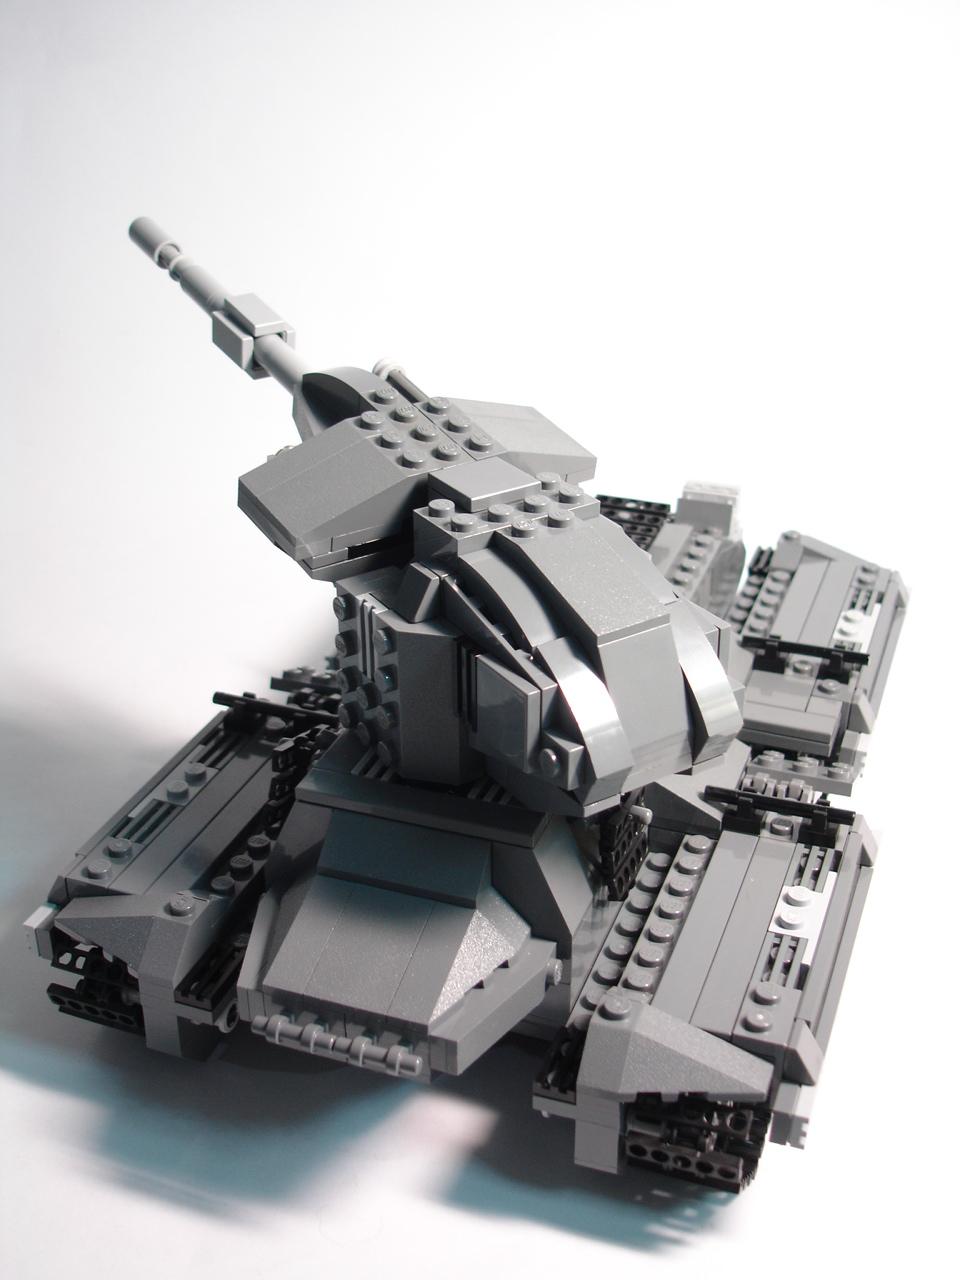 Halo Scorpion